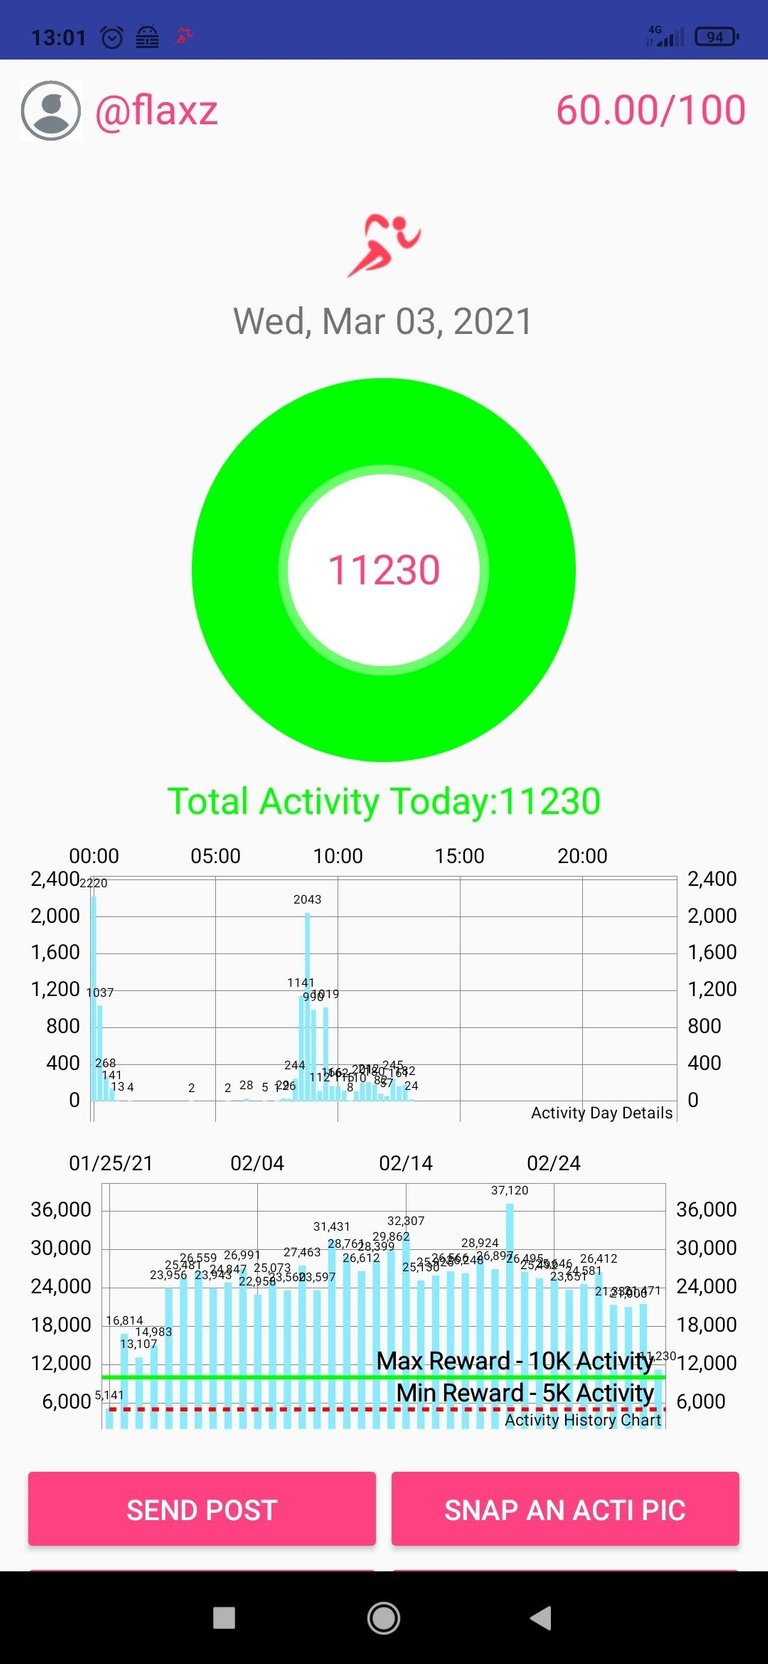 Screenshot_2021-03-03-13-01-37-737_io.actifit.fitnesstracker.actifitfitnesstracker.jpg